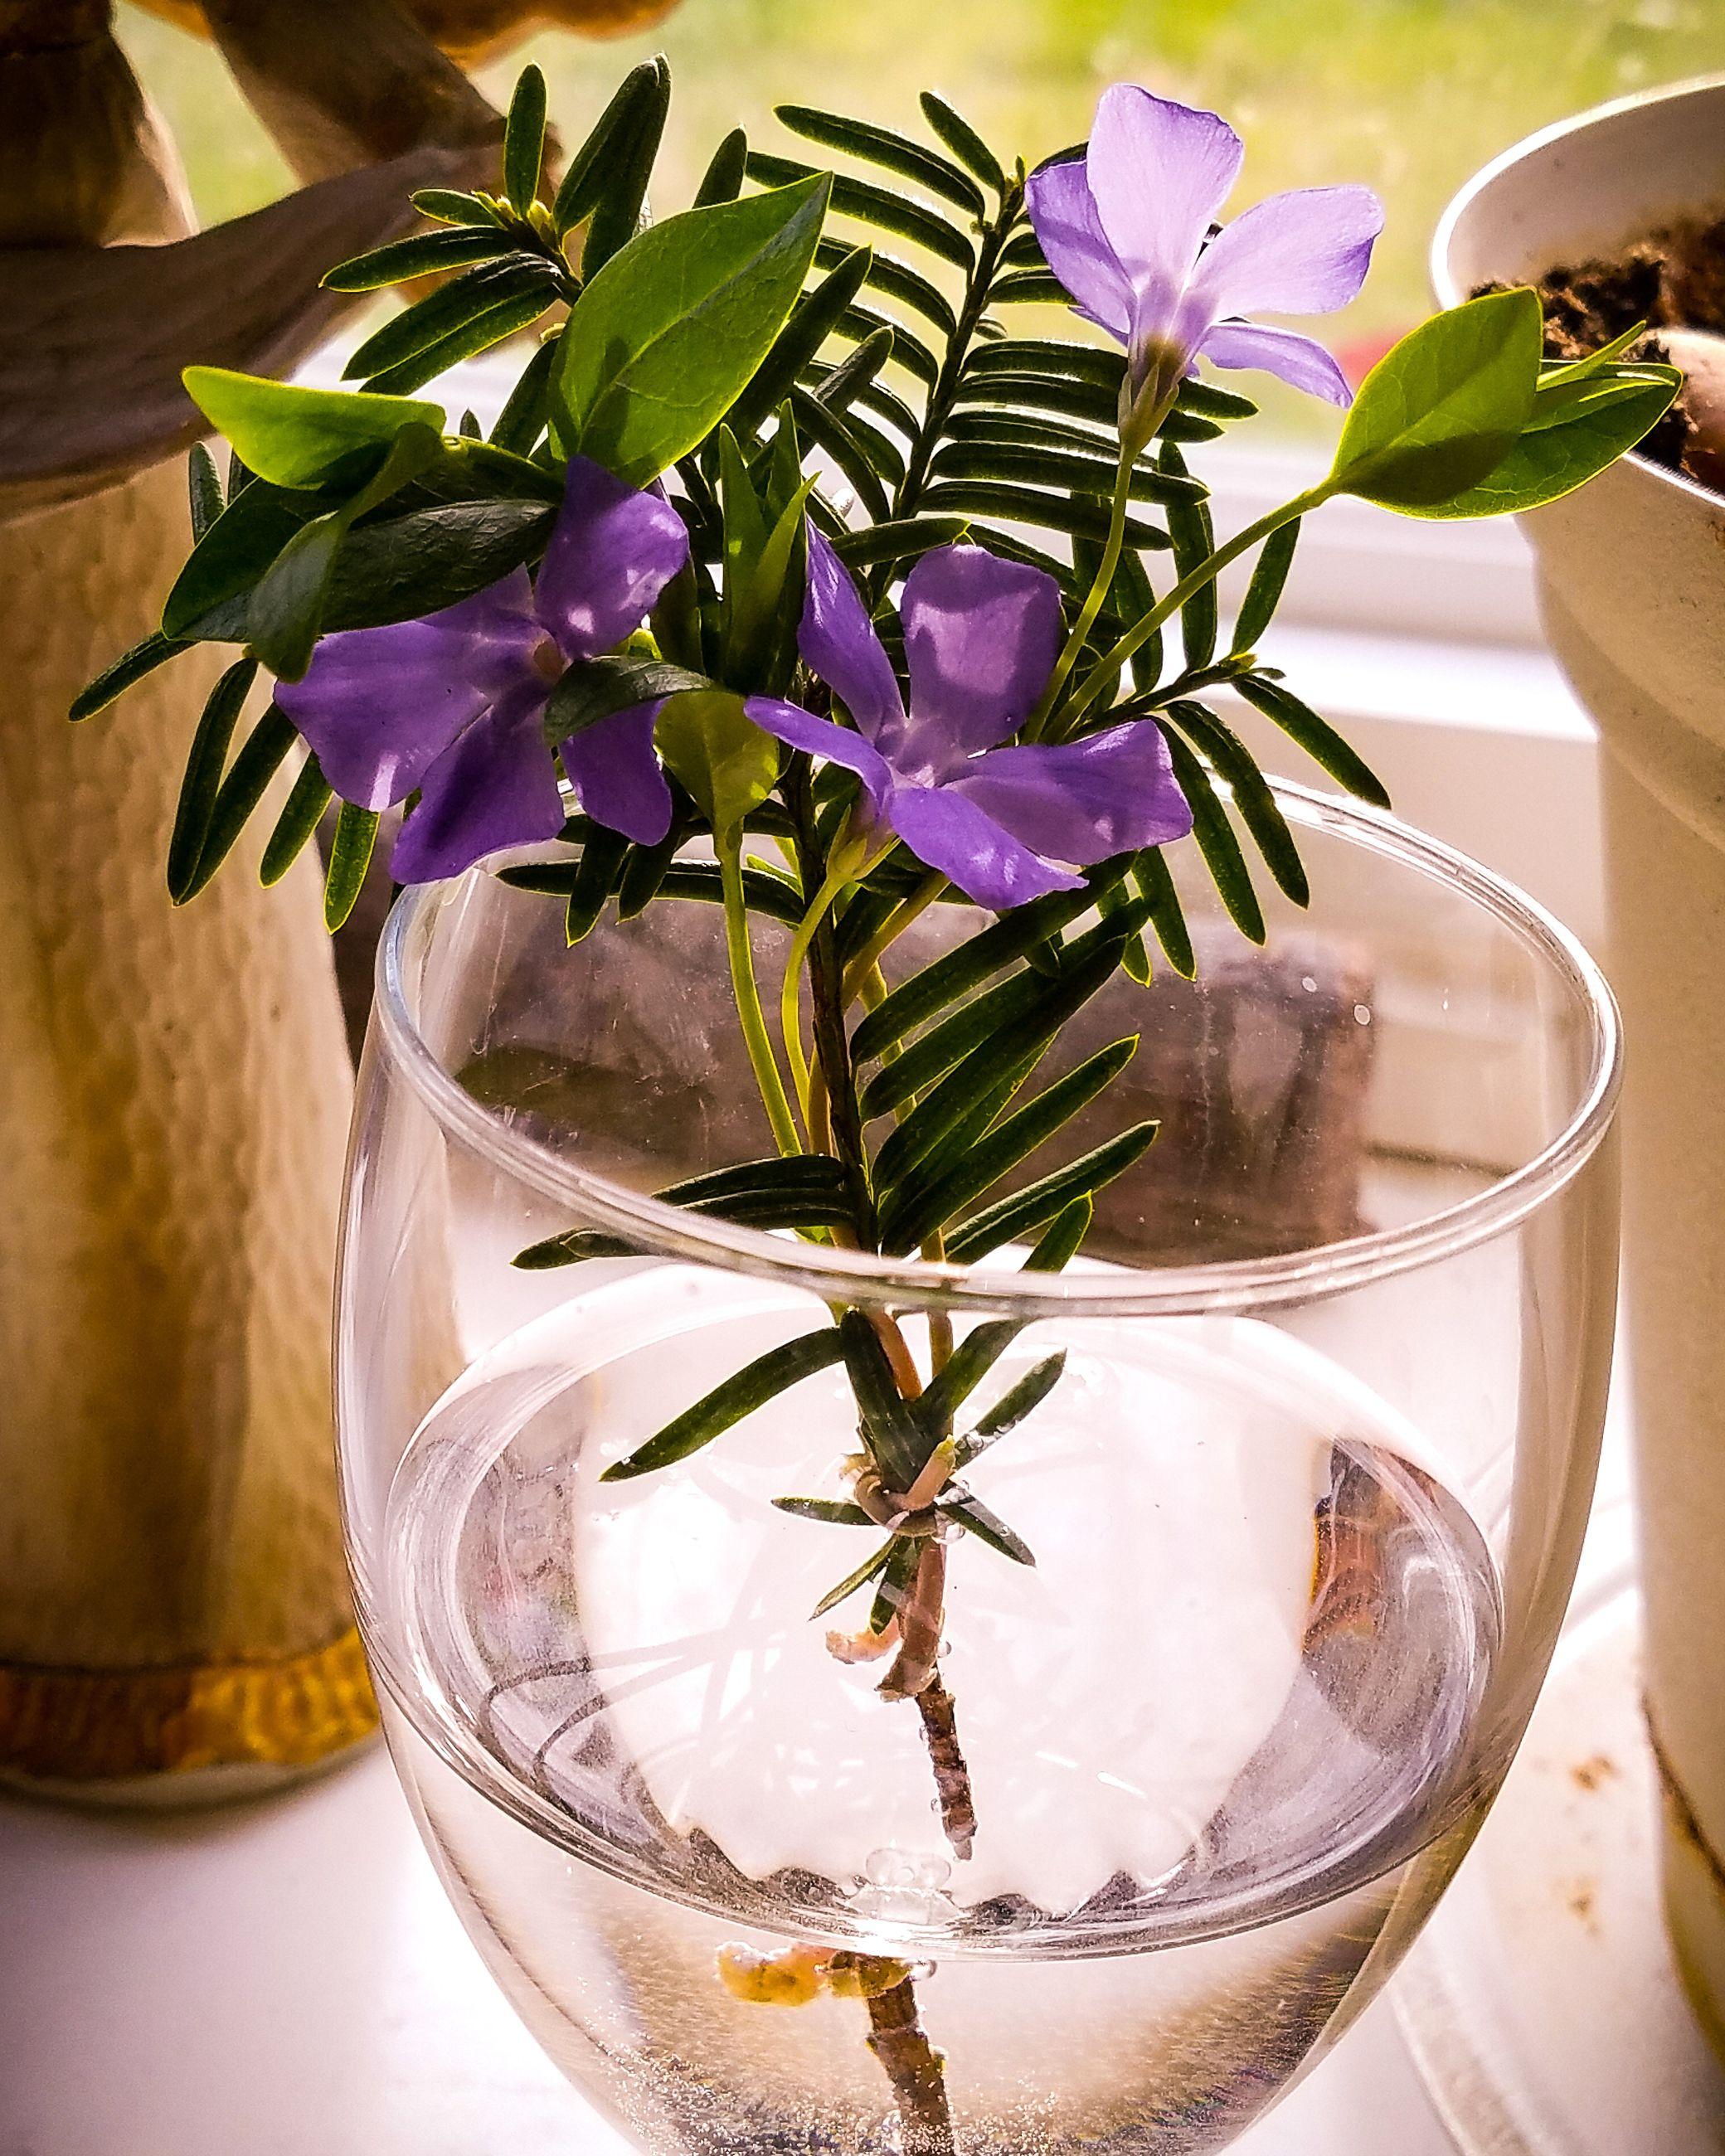 plant, flowering plant, flower, freshness, vase, beauty in nature, nature, indoors, close-up, leaf, table, plant part, glass - material, vulnerability, no people, fragility, transparent, flower head, glass, purple, flower arrangement